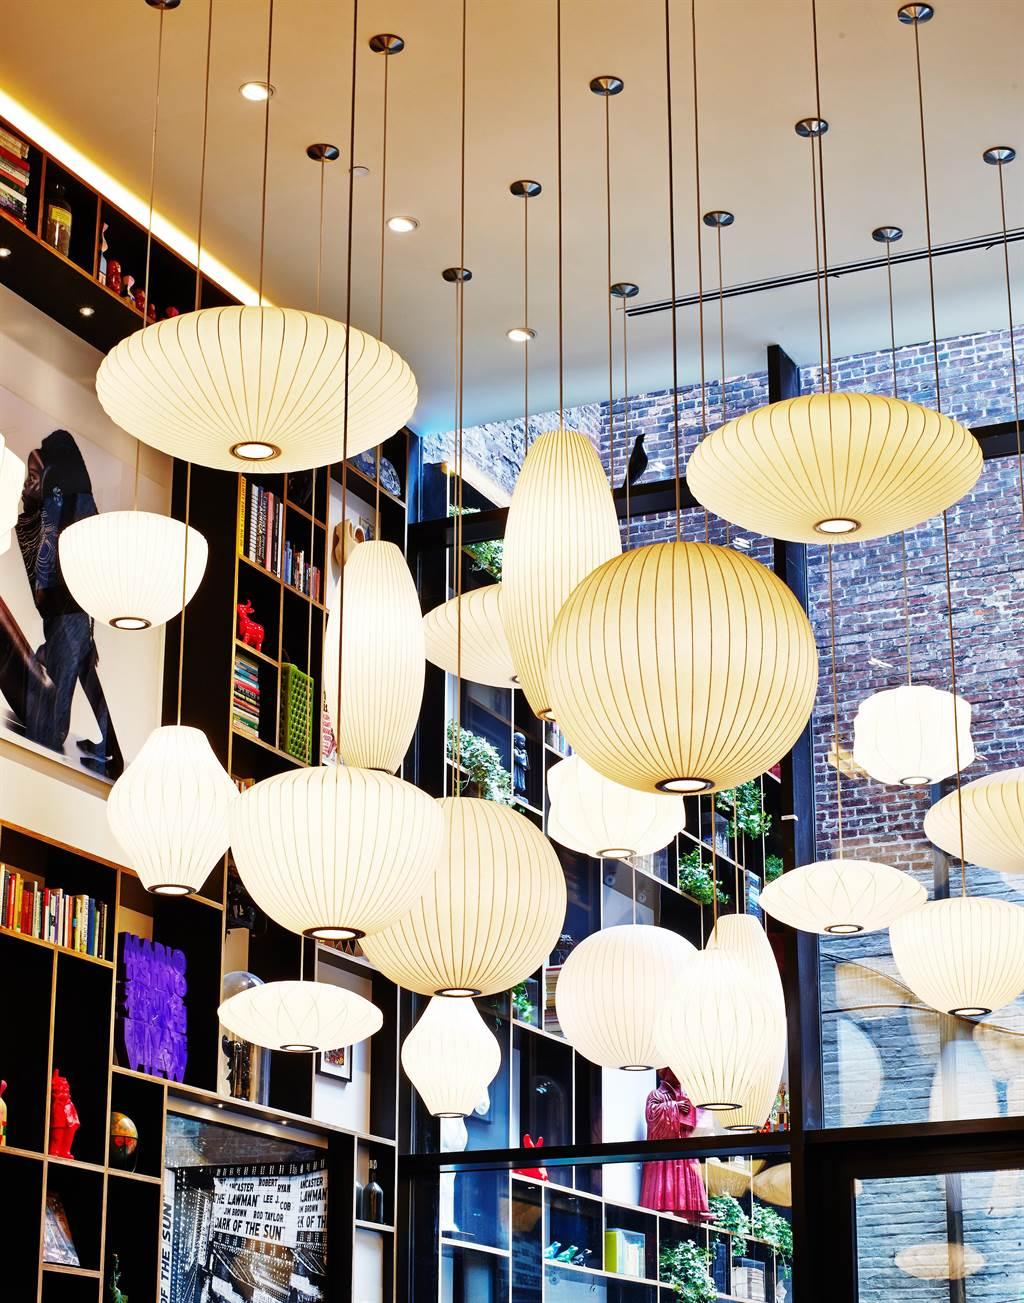 citizenM公共空間大量採用知名設計師設計的大型燈具裝飾。 (圖/世民酒店)